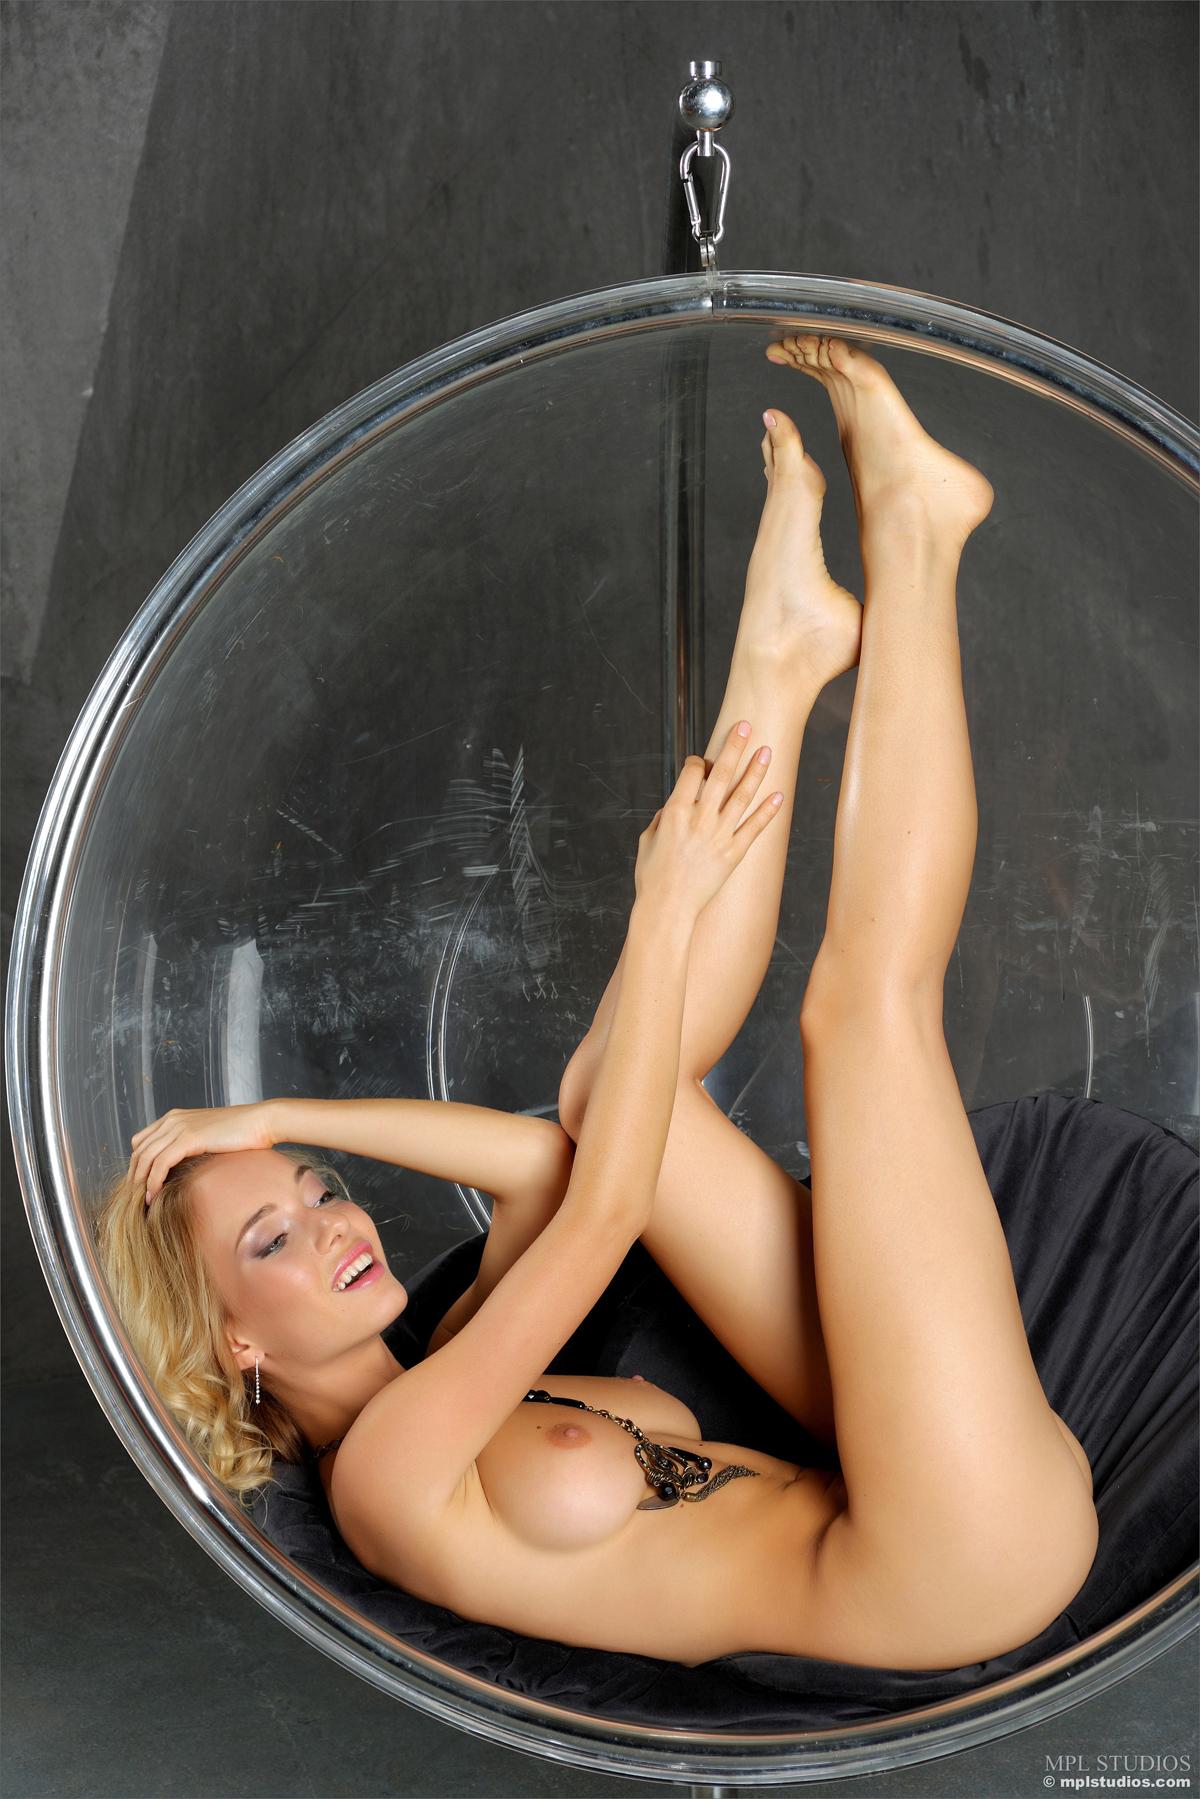 Blonde Danica Teasing Glimpses - picture 04